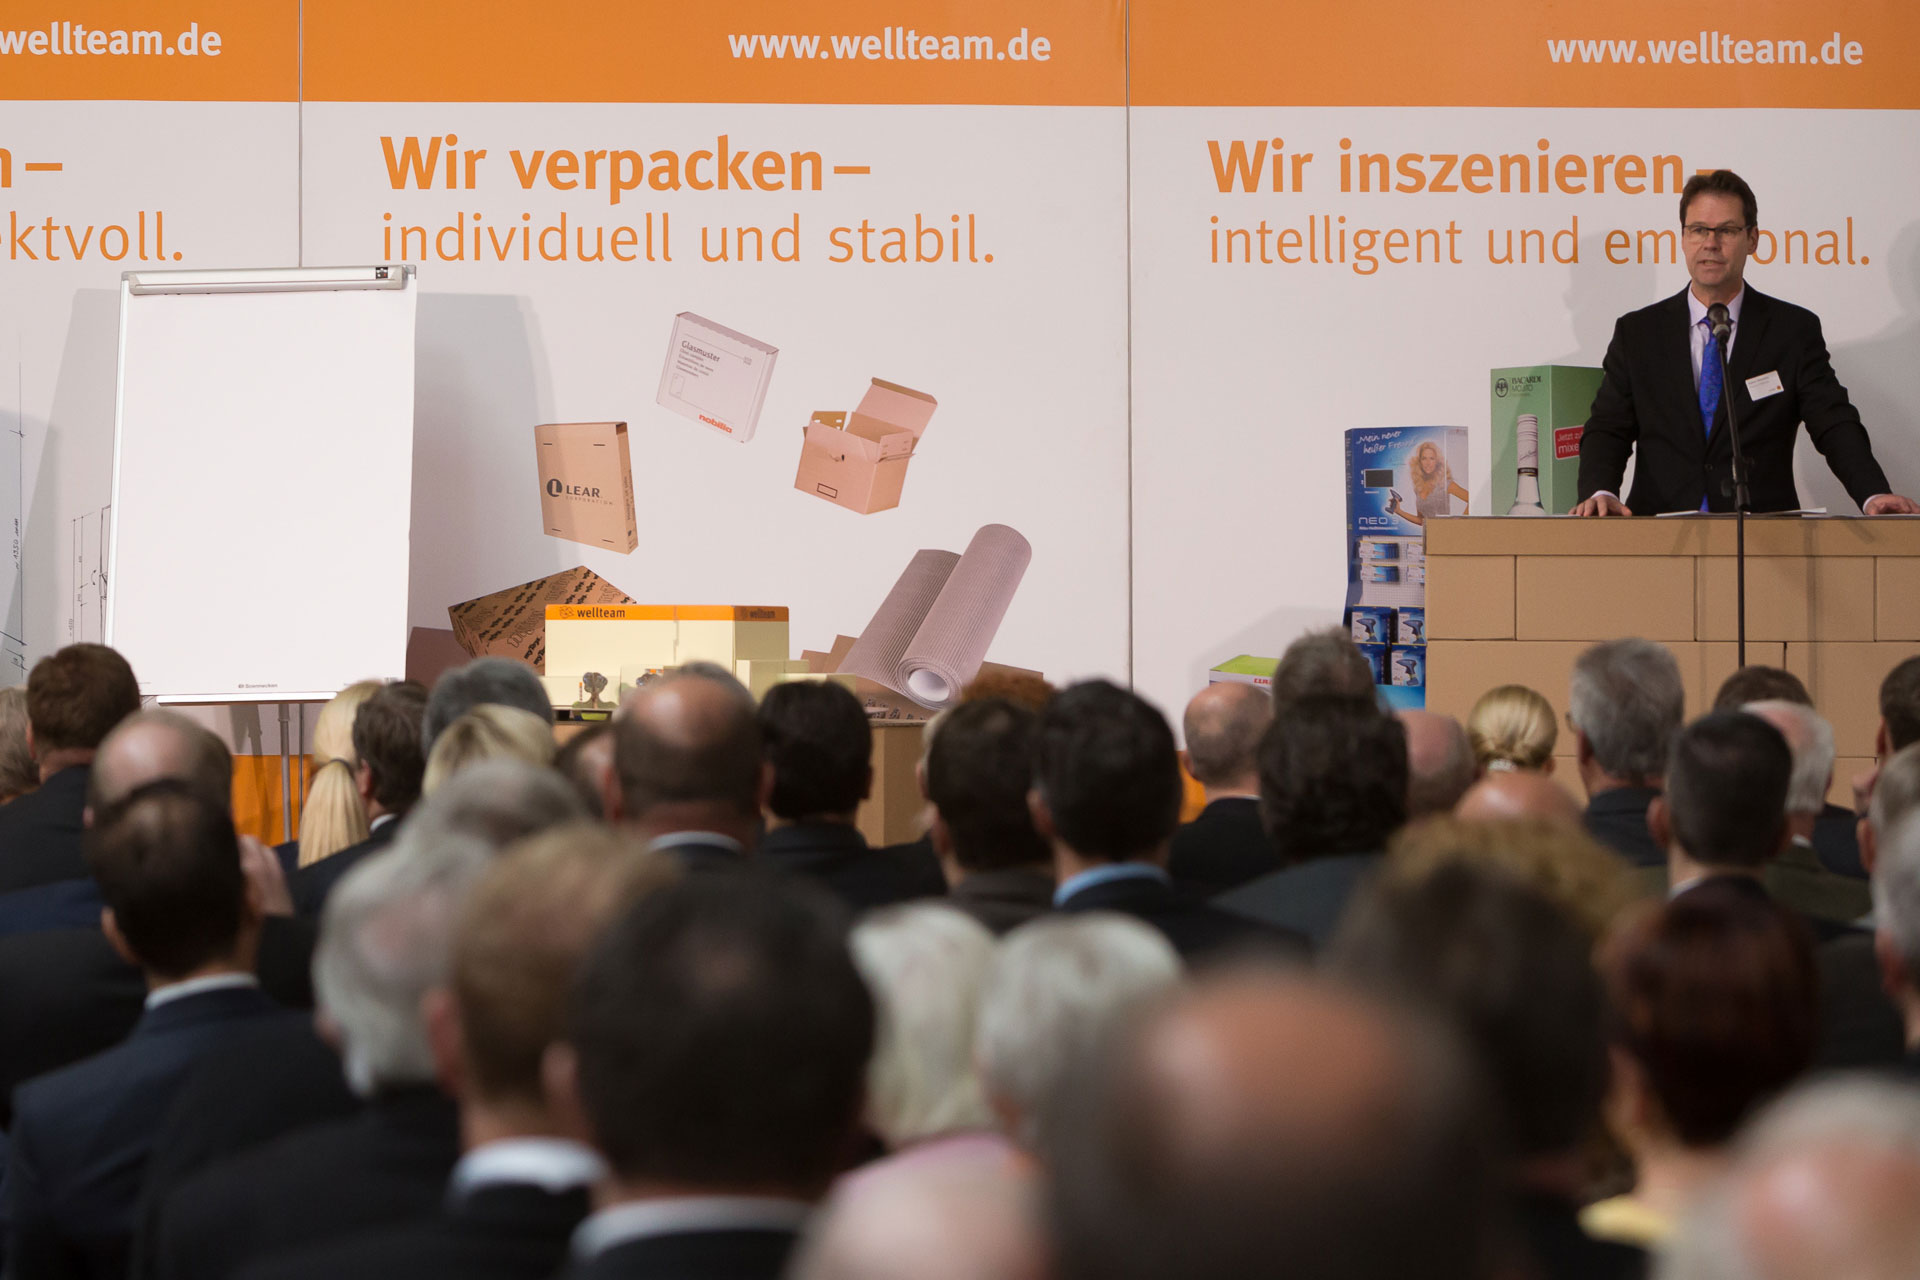 Robert Wiehofsky hält eine Rede bei der Eröffnungsfeier der Firma Wellteam